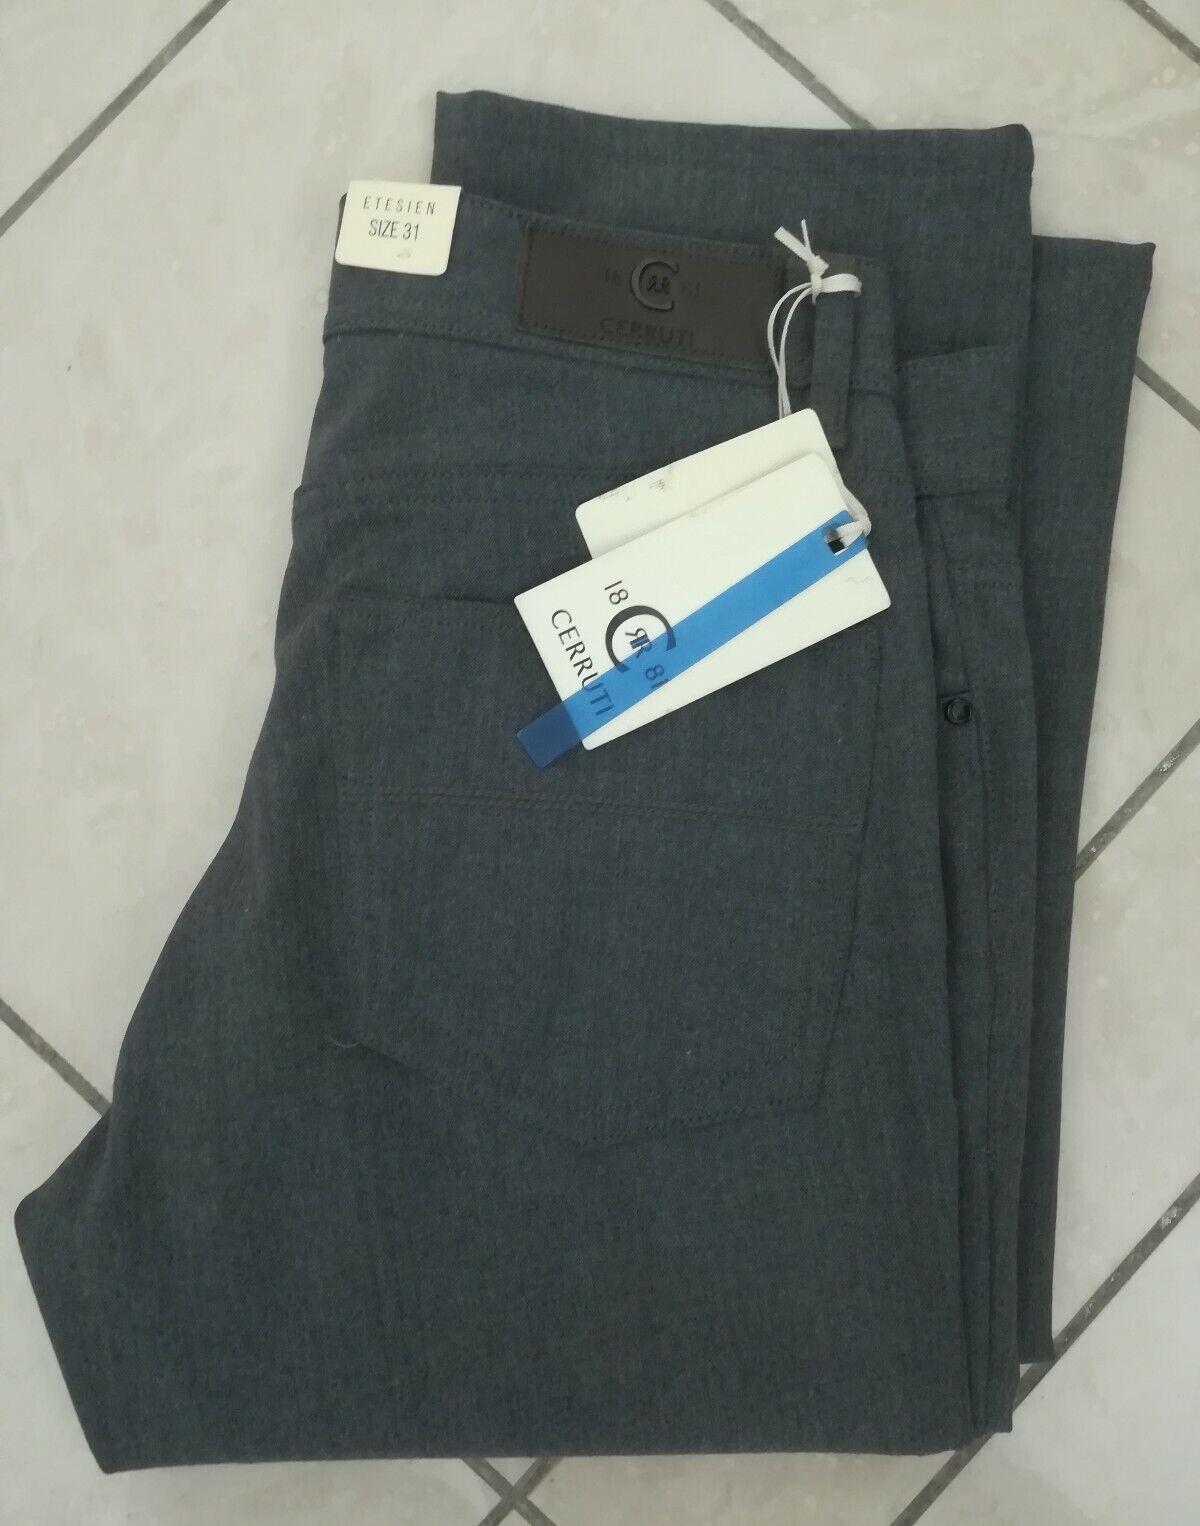 Jeans Cerruti in Lana Stretch Grigio medio Regular Fit Taglia Taglia Taglia 56 US42 Saldi e274f4